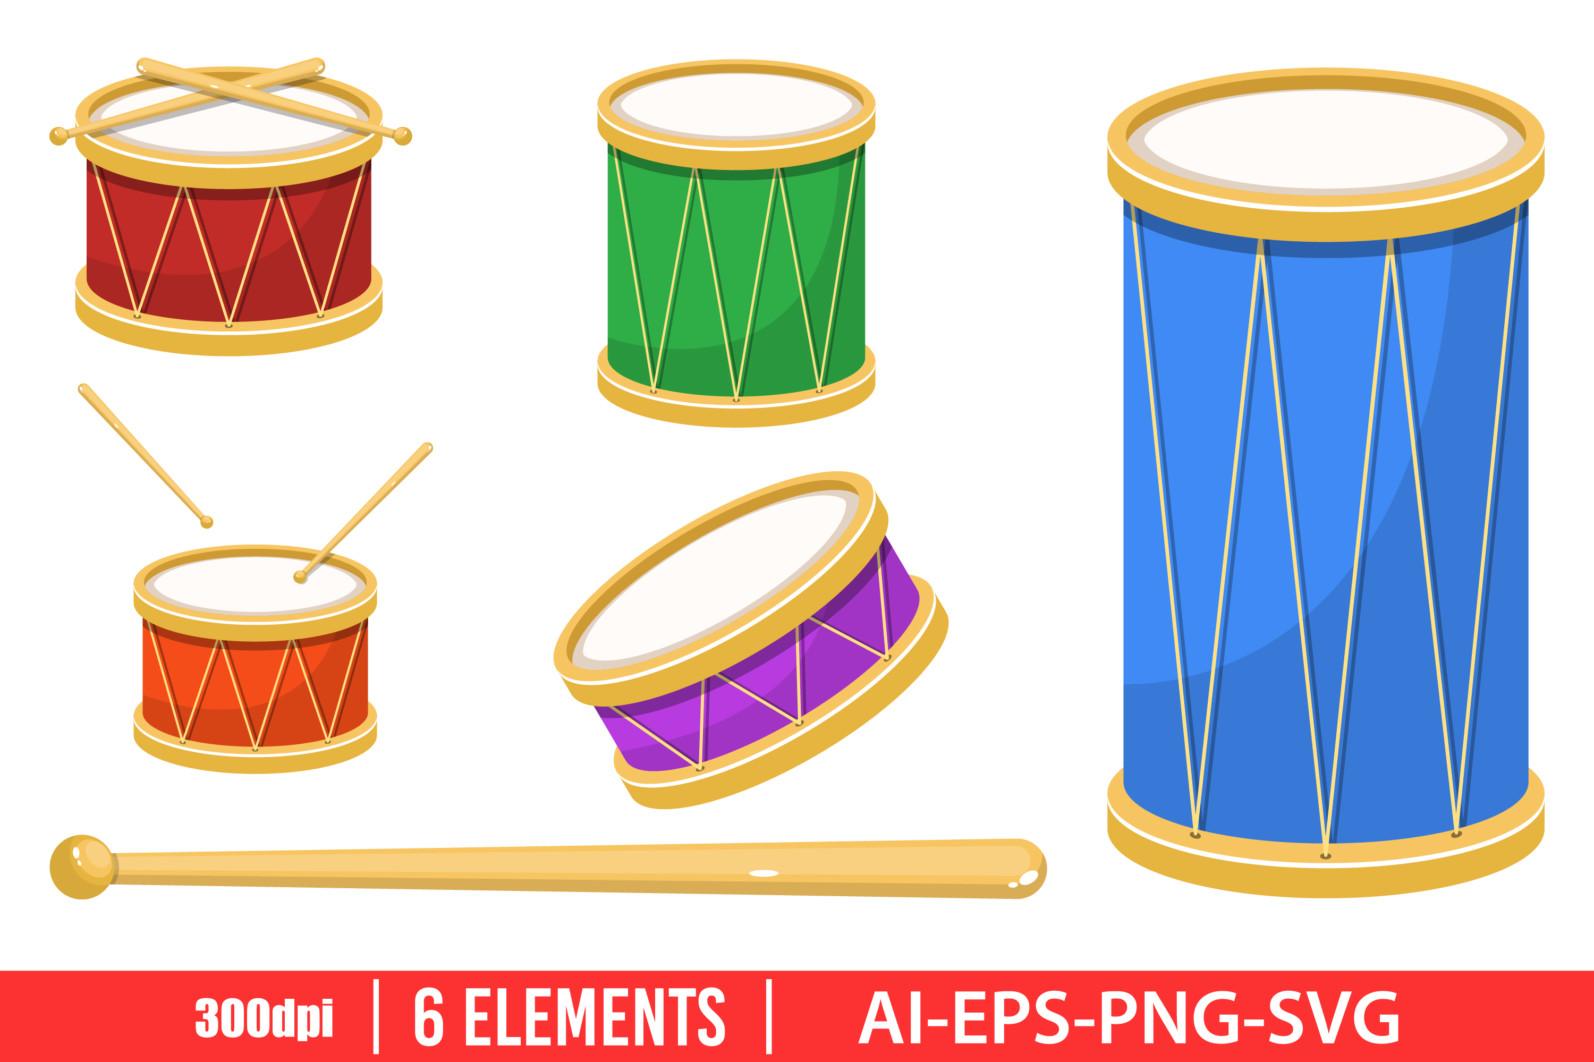 Drum clipart vector design illustration. Drum set. Vector Clipart Print - DRUM scaled -